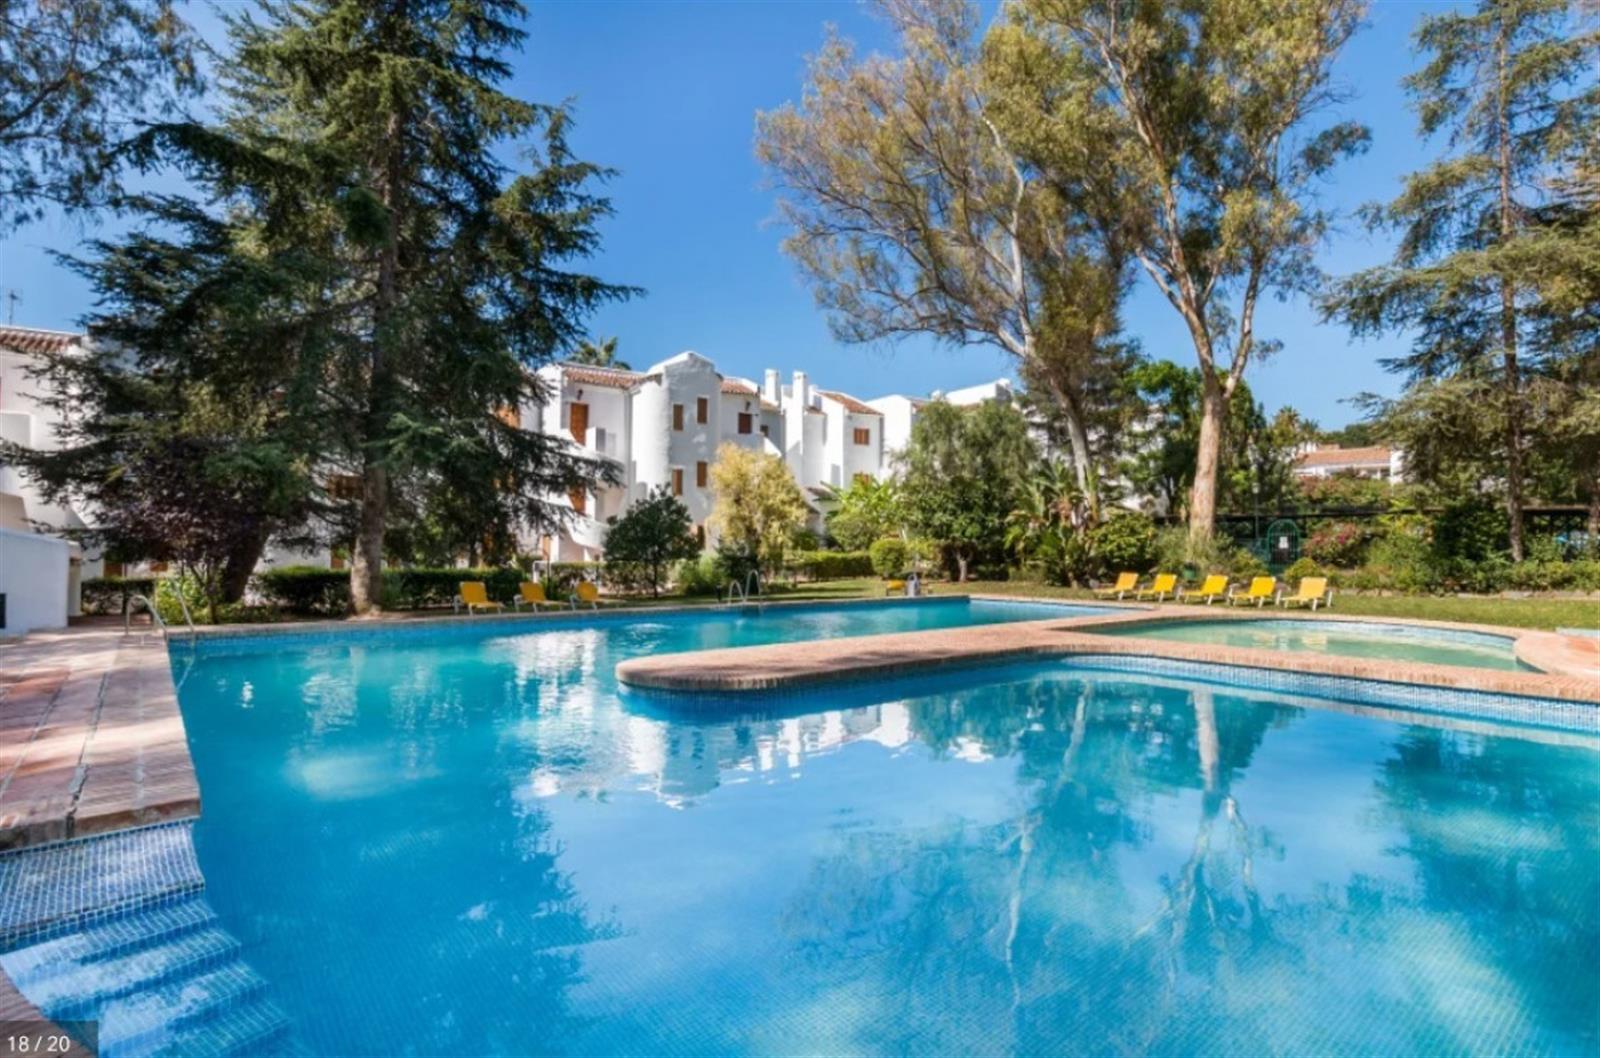 2 bedroom ground floor apartment, Le Village, Nueva Andalucia